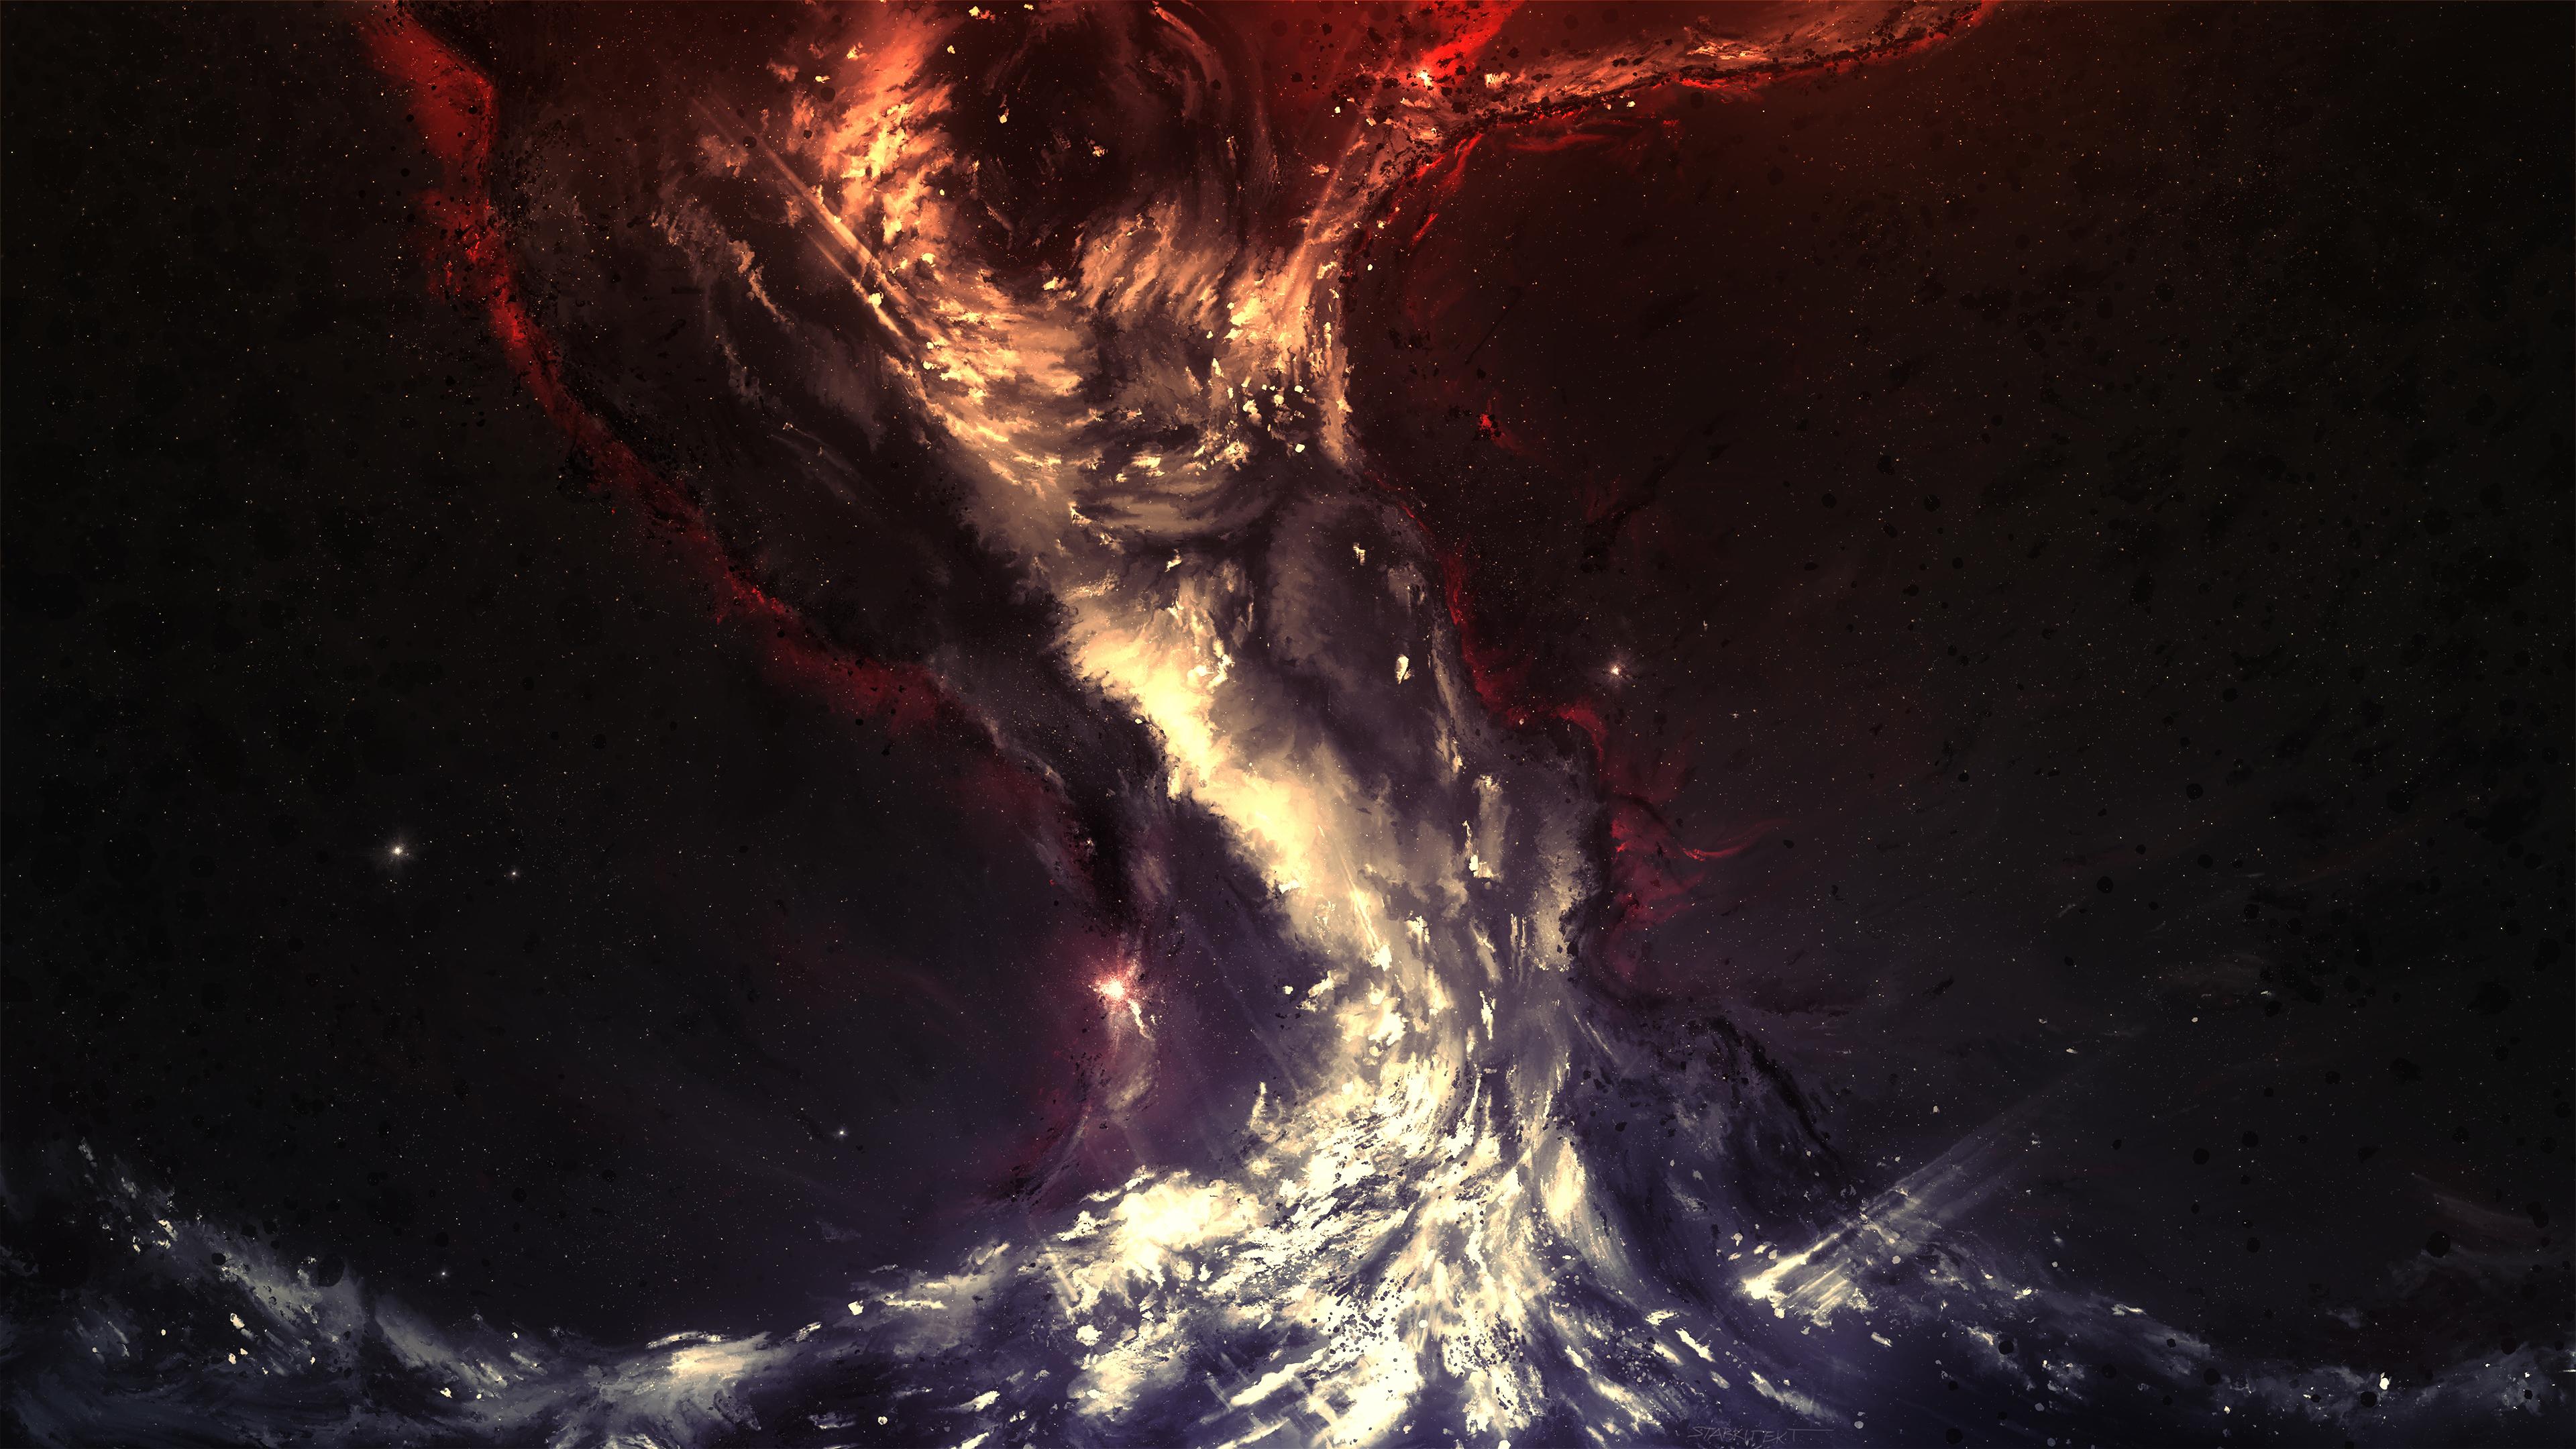 Wallpaper 3840x2160 space art universe 4K Ultra HD HD Background 3840x2160